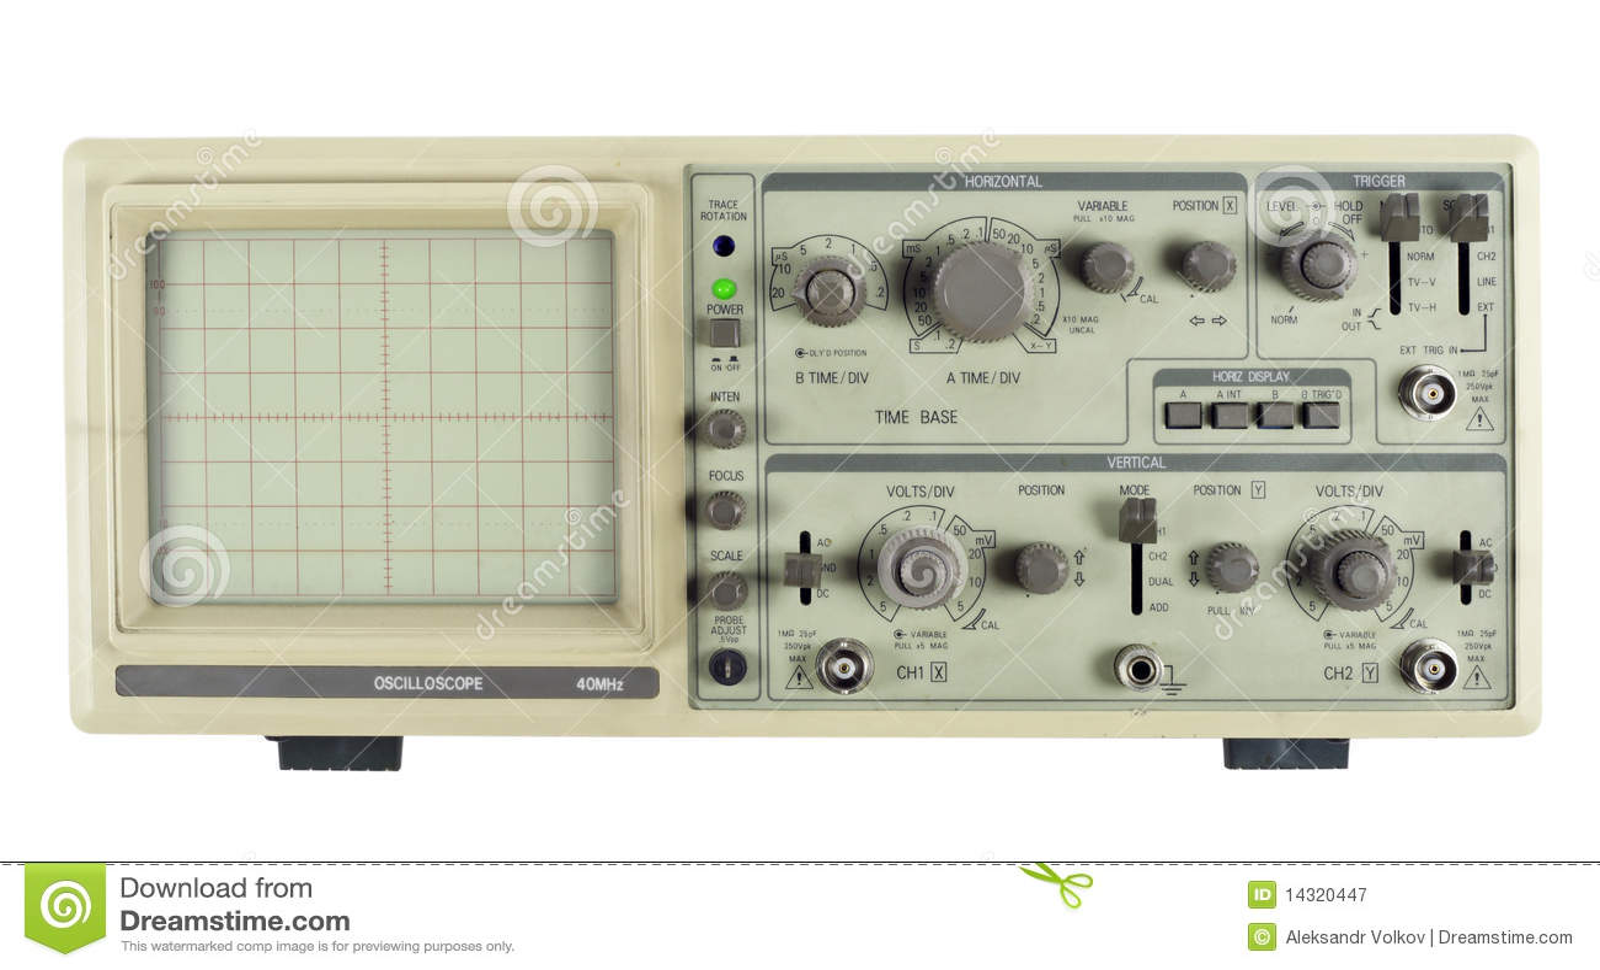 Old Oscilloscope Screen : Old analogue oscilloscope royalty free stock photography